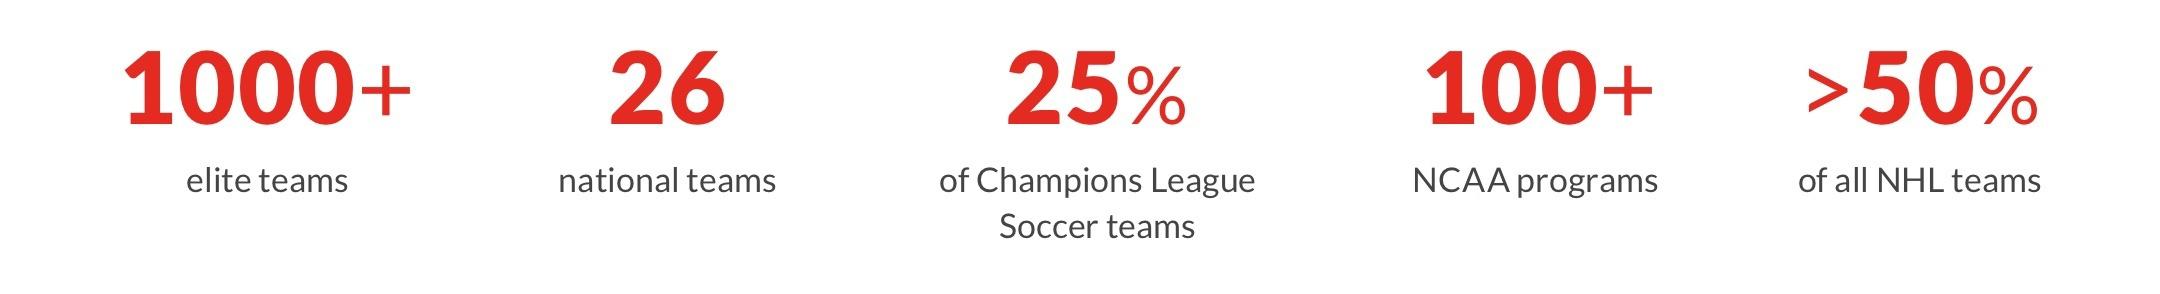 1000+ elite teams   26 national teams   100+ NCAA programs   >50% of all NHL teams   25% of Champions League Soccer teams